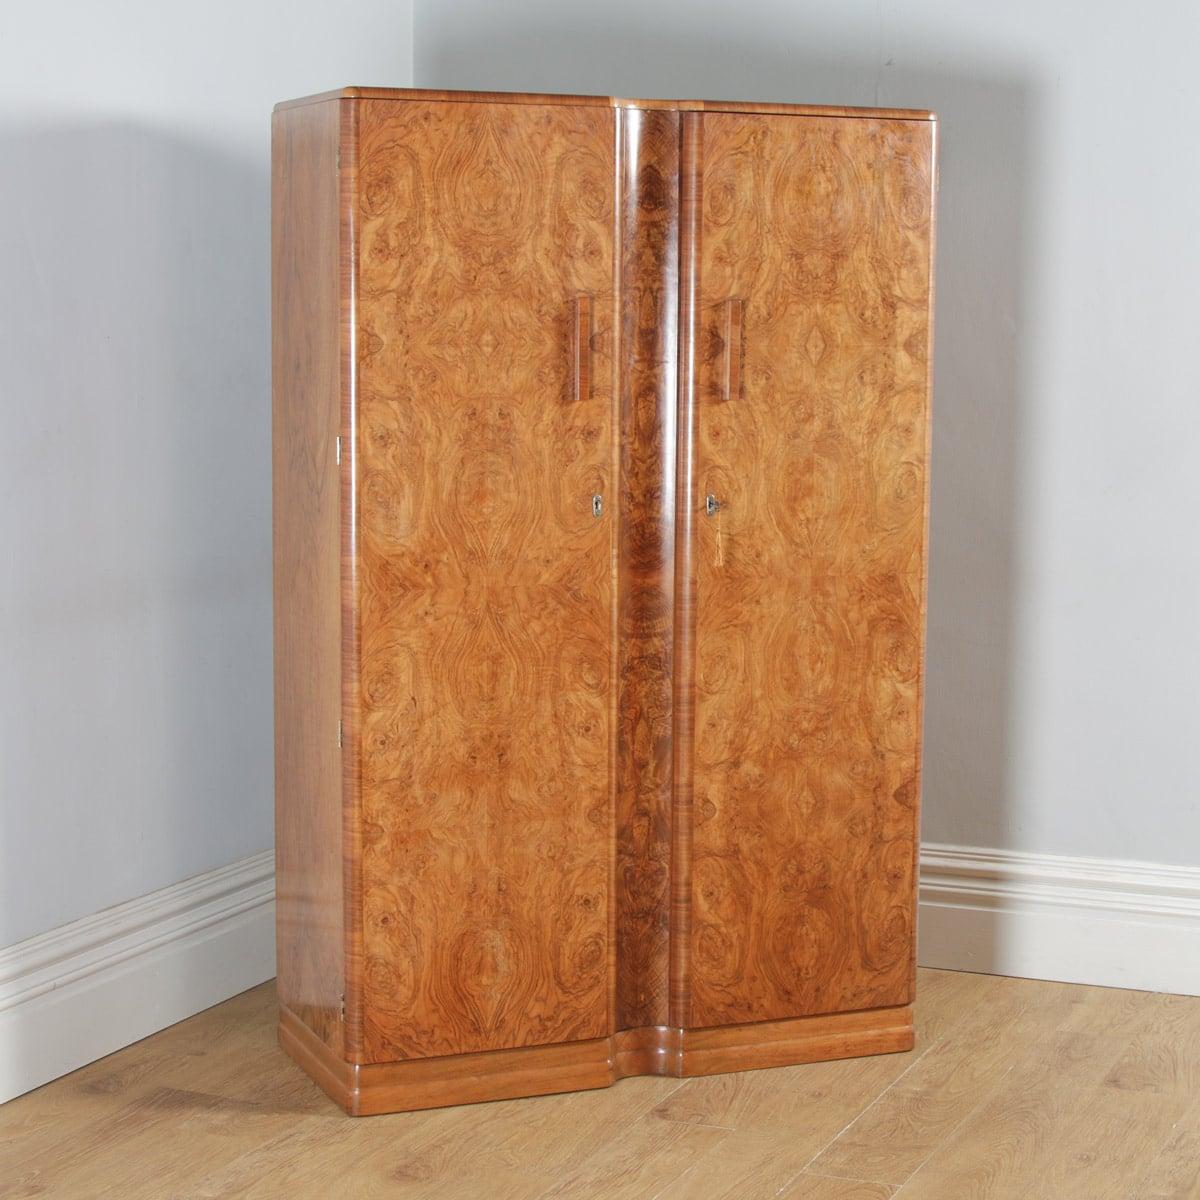 antique art deco burr walnut wardrobe by ray miles of liverpool circa 1930